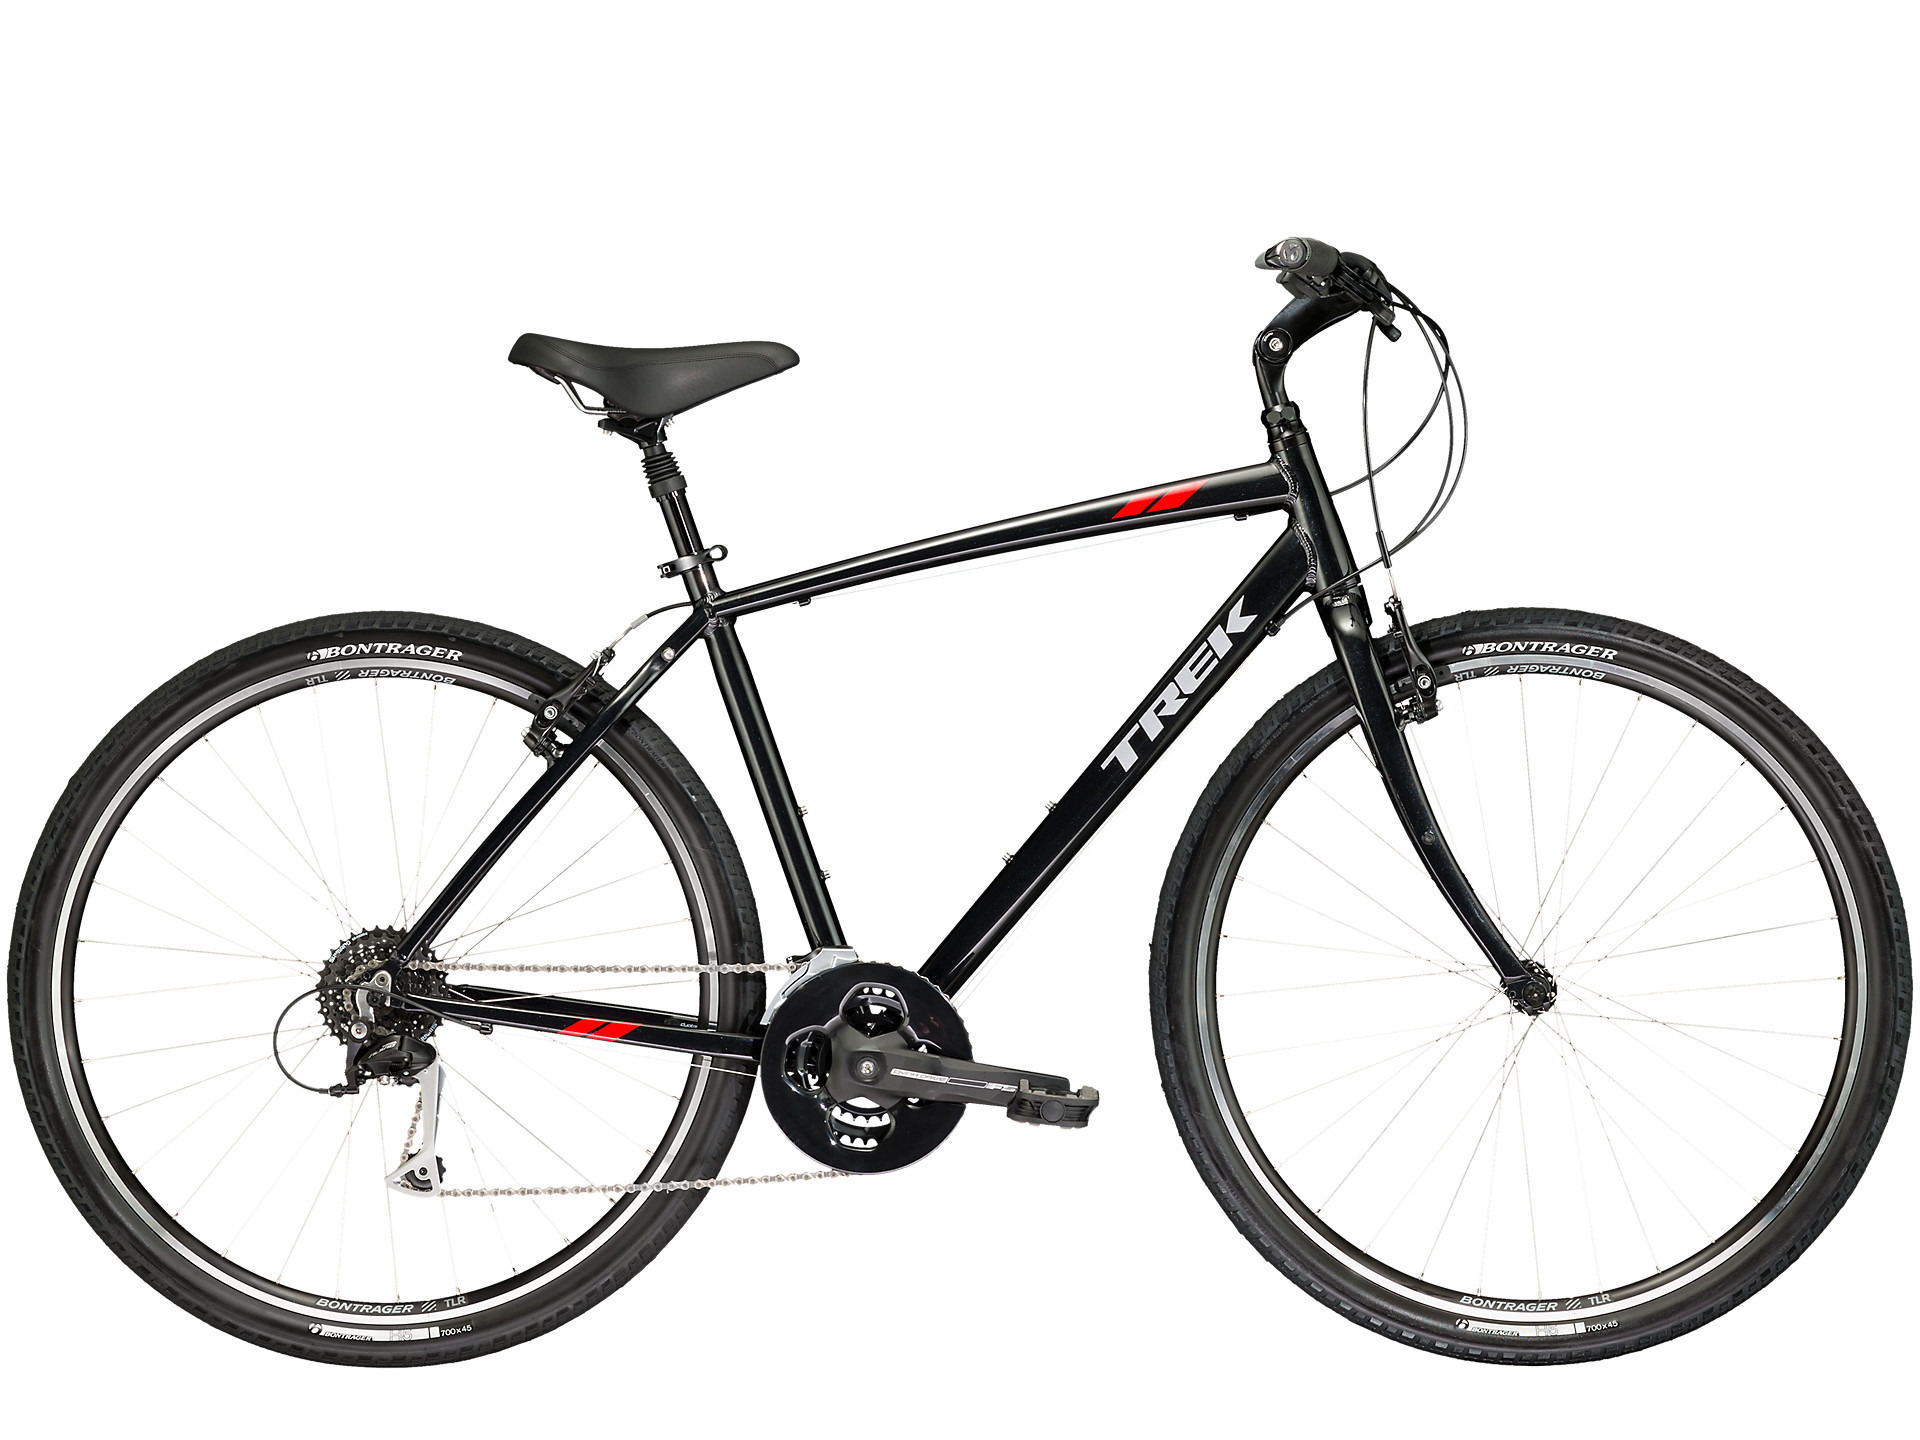 69fc26d8e13 Verve 3 | Trek Bikes